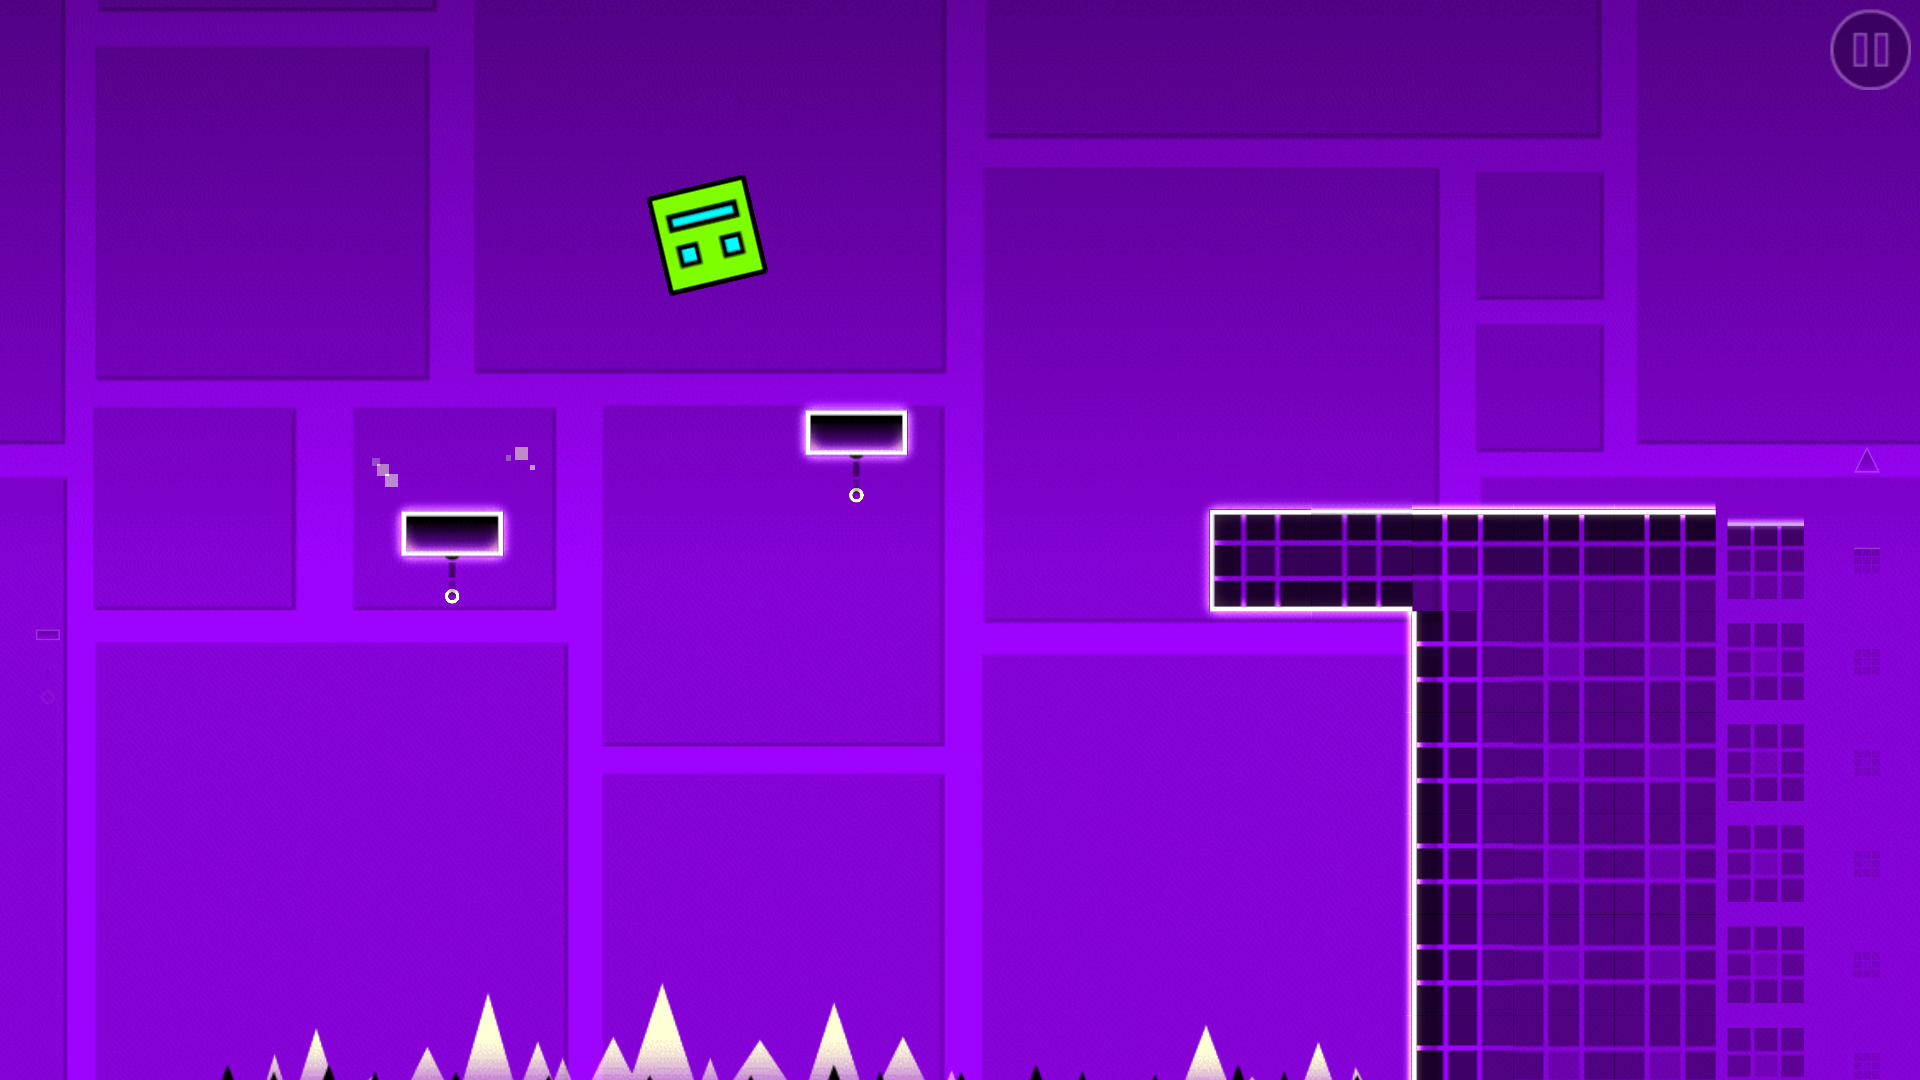 Review Geometry Dash Is a Super Hard Super Fun Musical Platformer 1920x1080